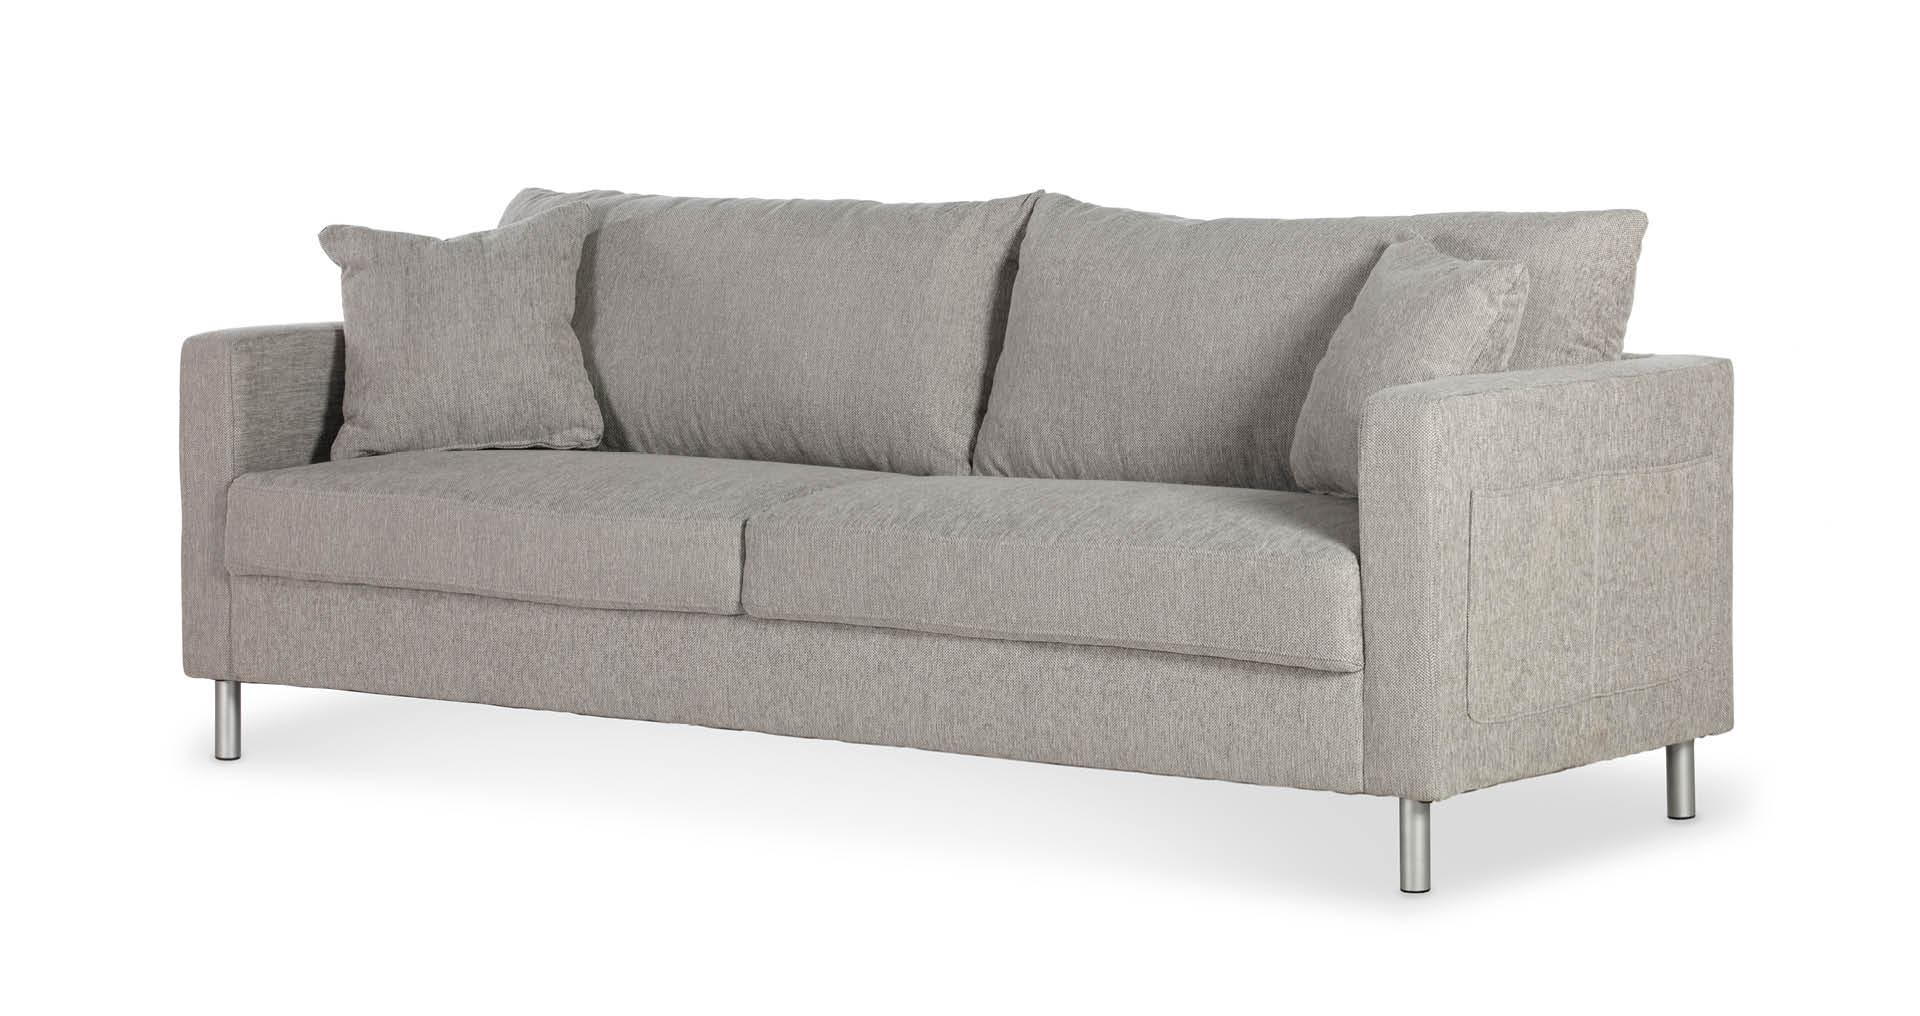 "ספה אניסטון 210 ס""מ בגוון אפור סקנדינבי"